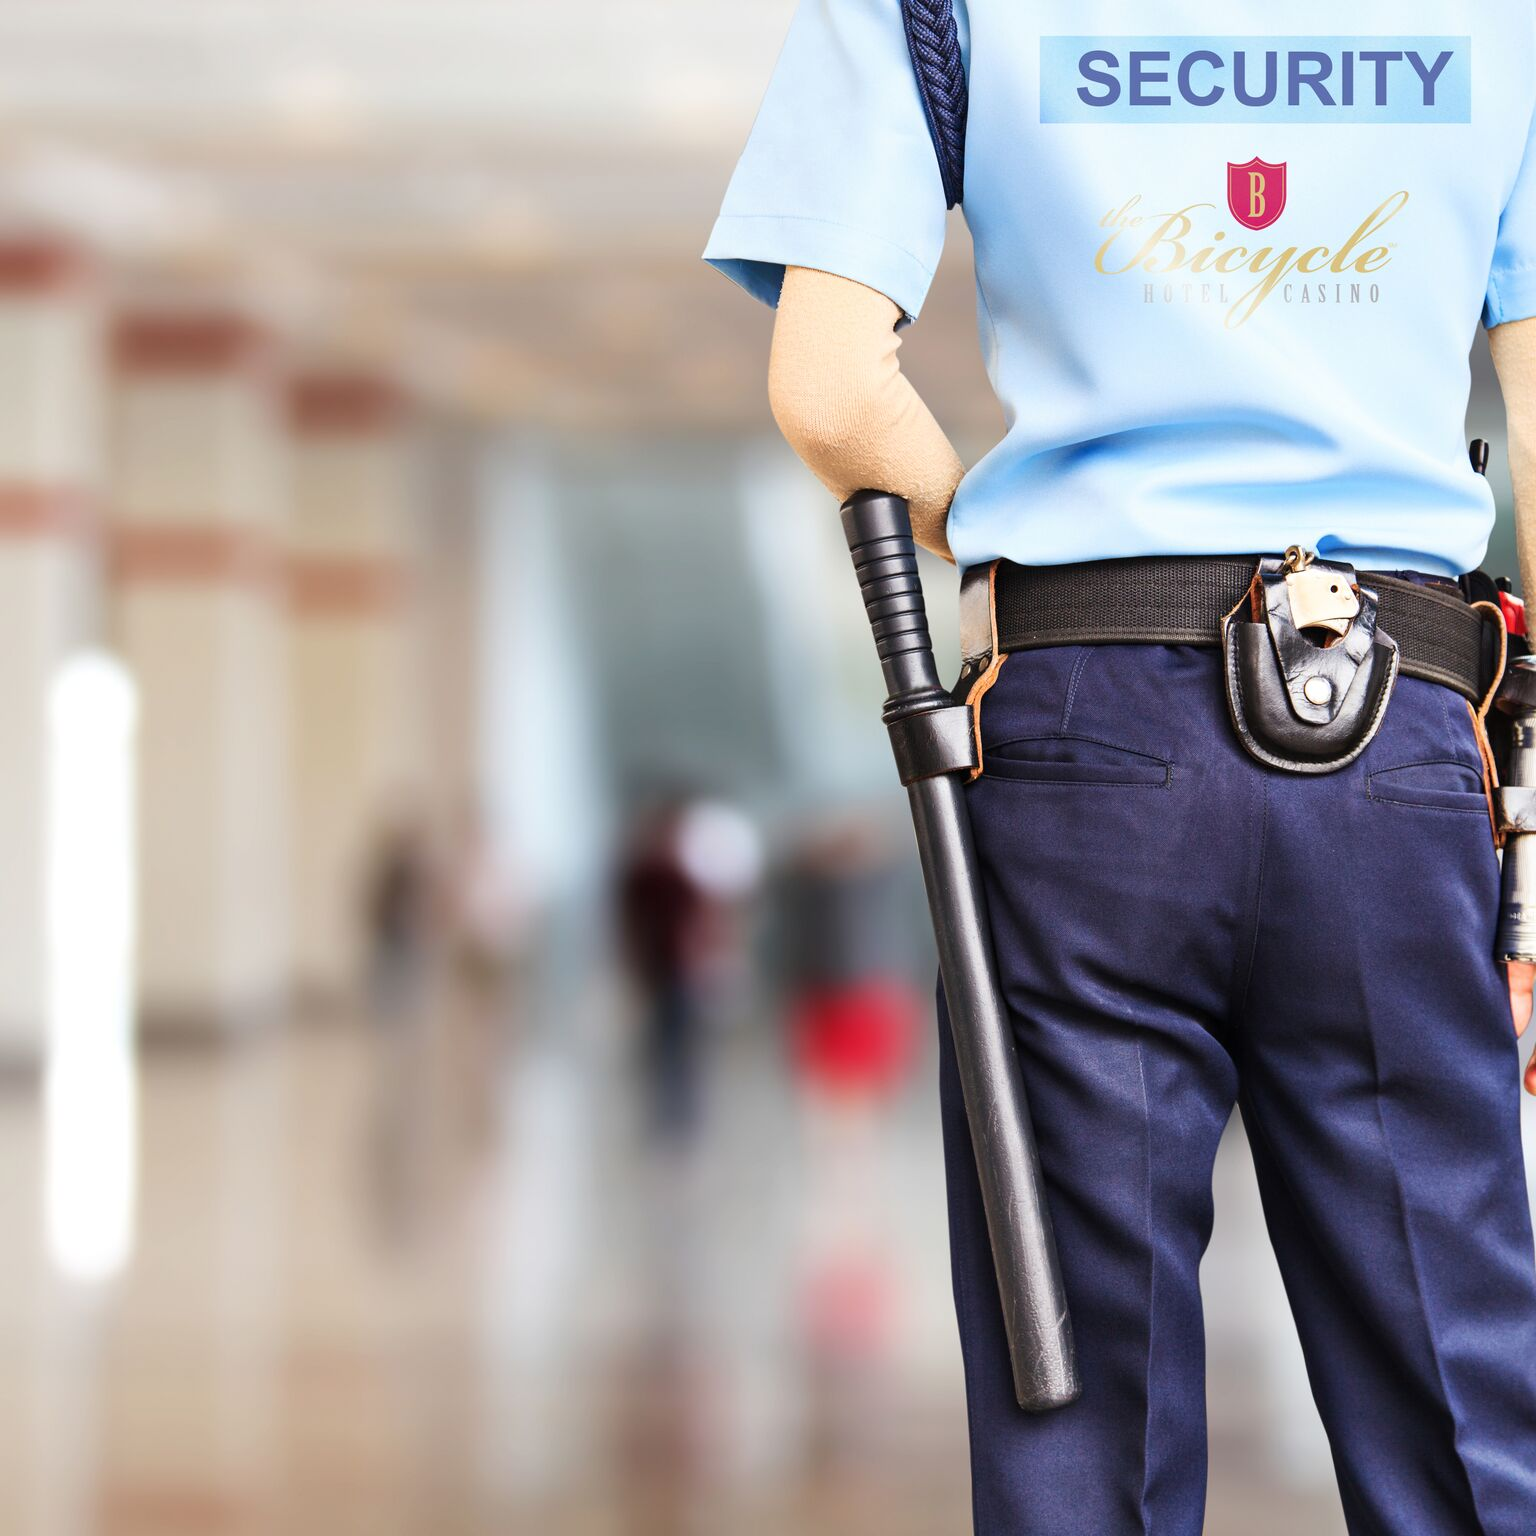 California casino security jobs transformers 2 revenge of the fallen save games pc